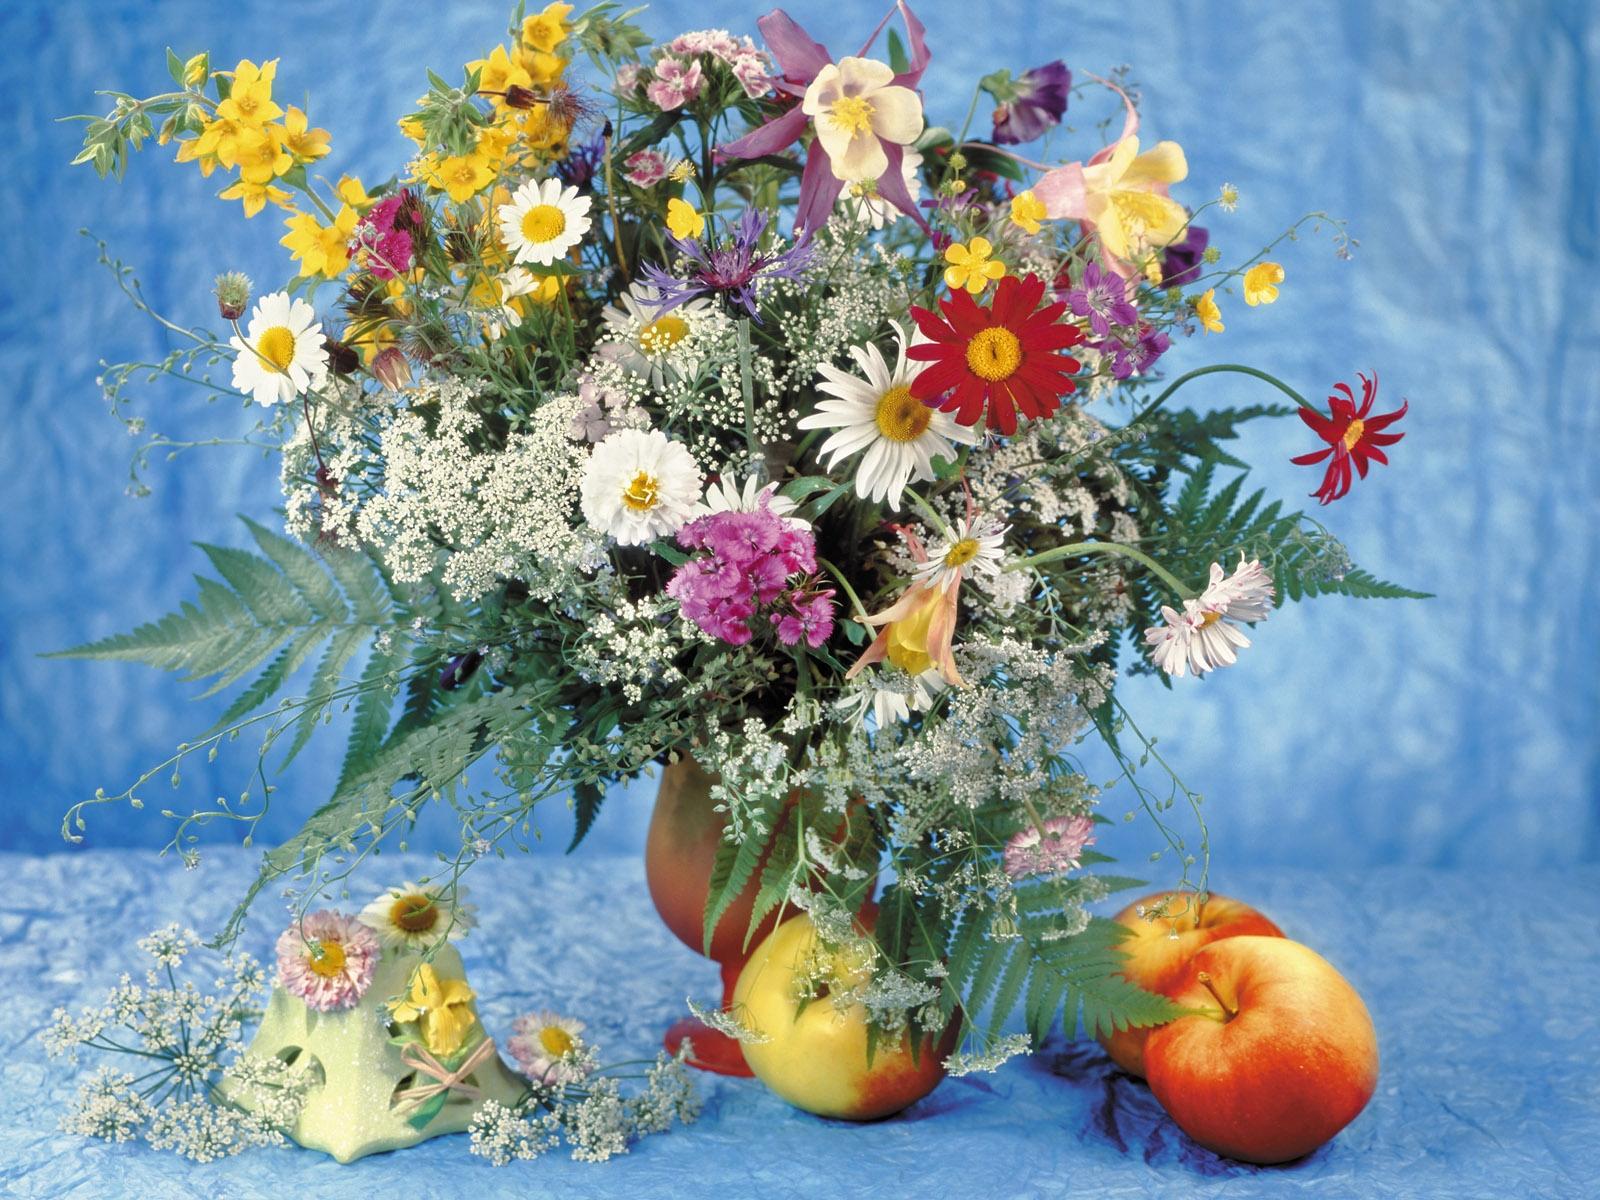 daisies_vase_table_apples_bouquet-790285.jpg!d